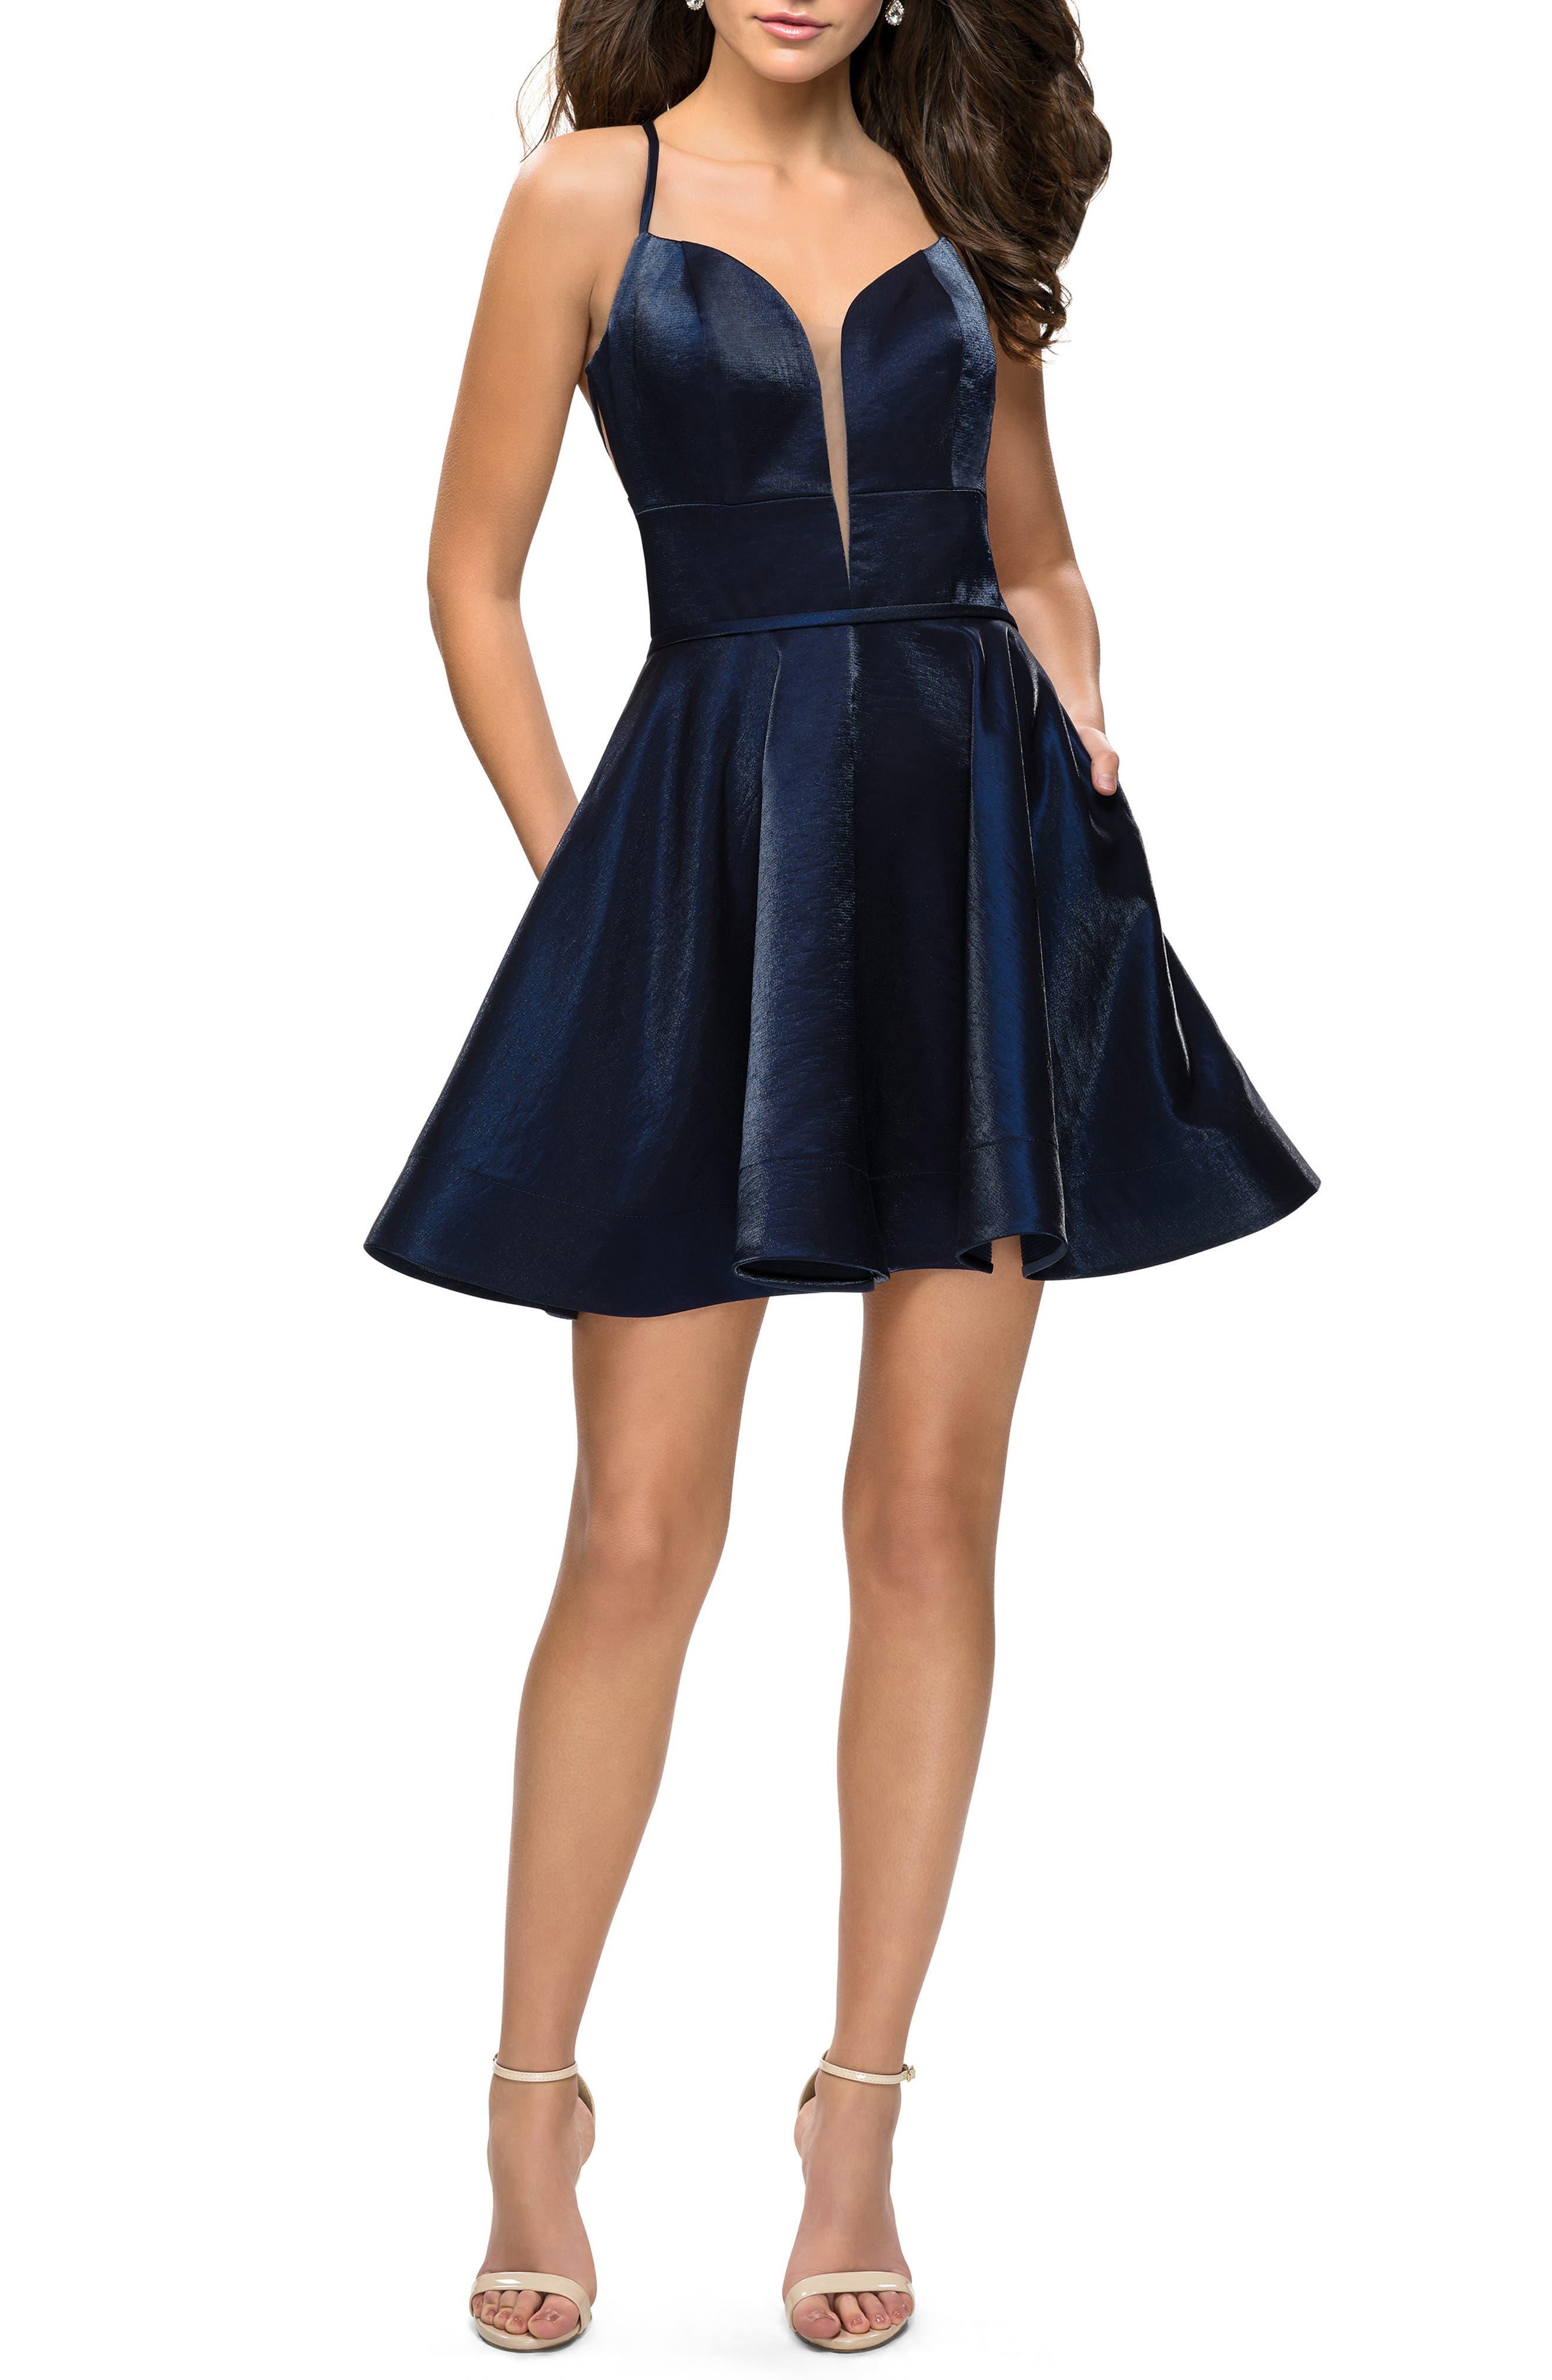 LA FEMME Satin Fit & Flare Dress in Navy